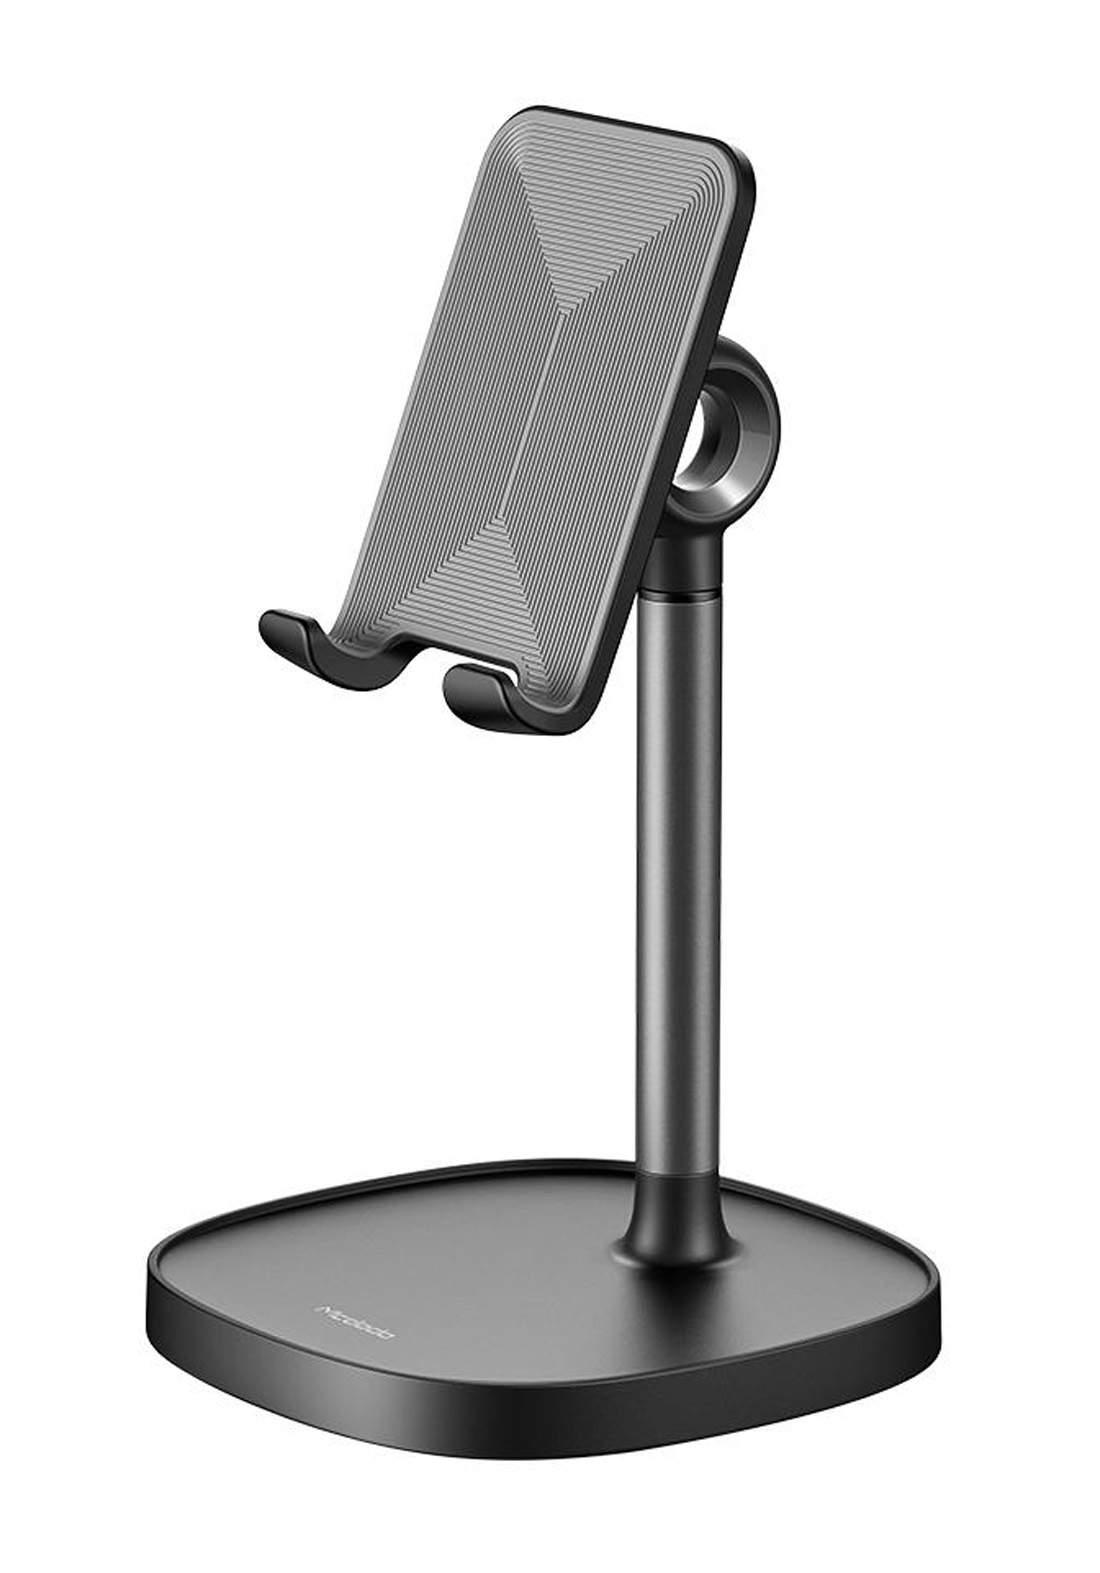 (3113)Mcdodo TB07821 360 Degree Rotating Mobile Phone Holder - Black حامل موبايل